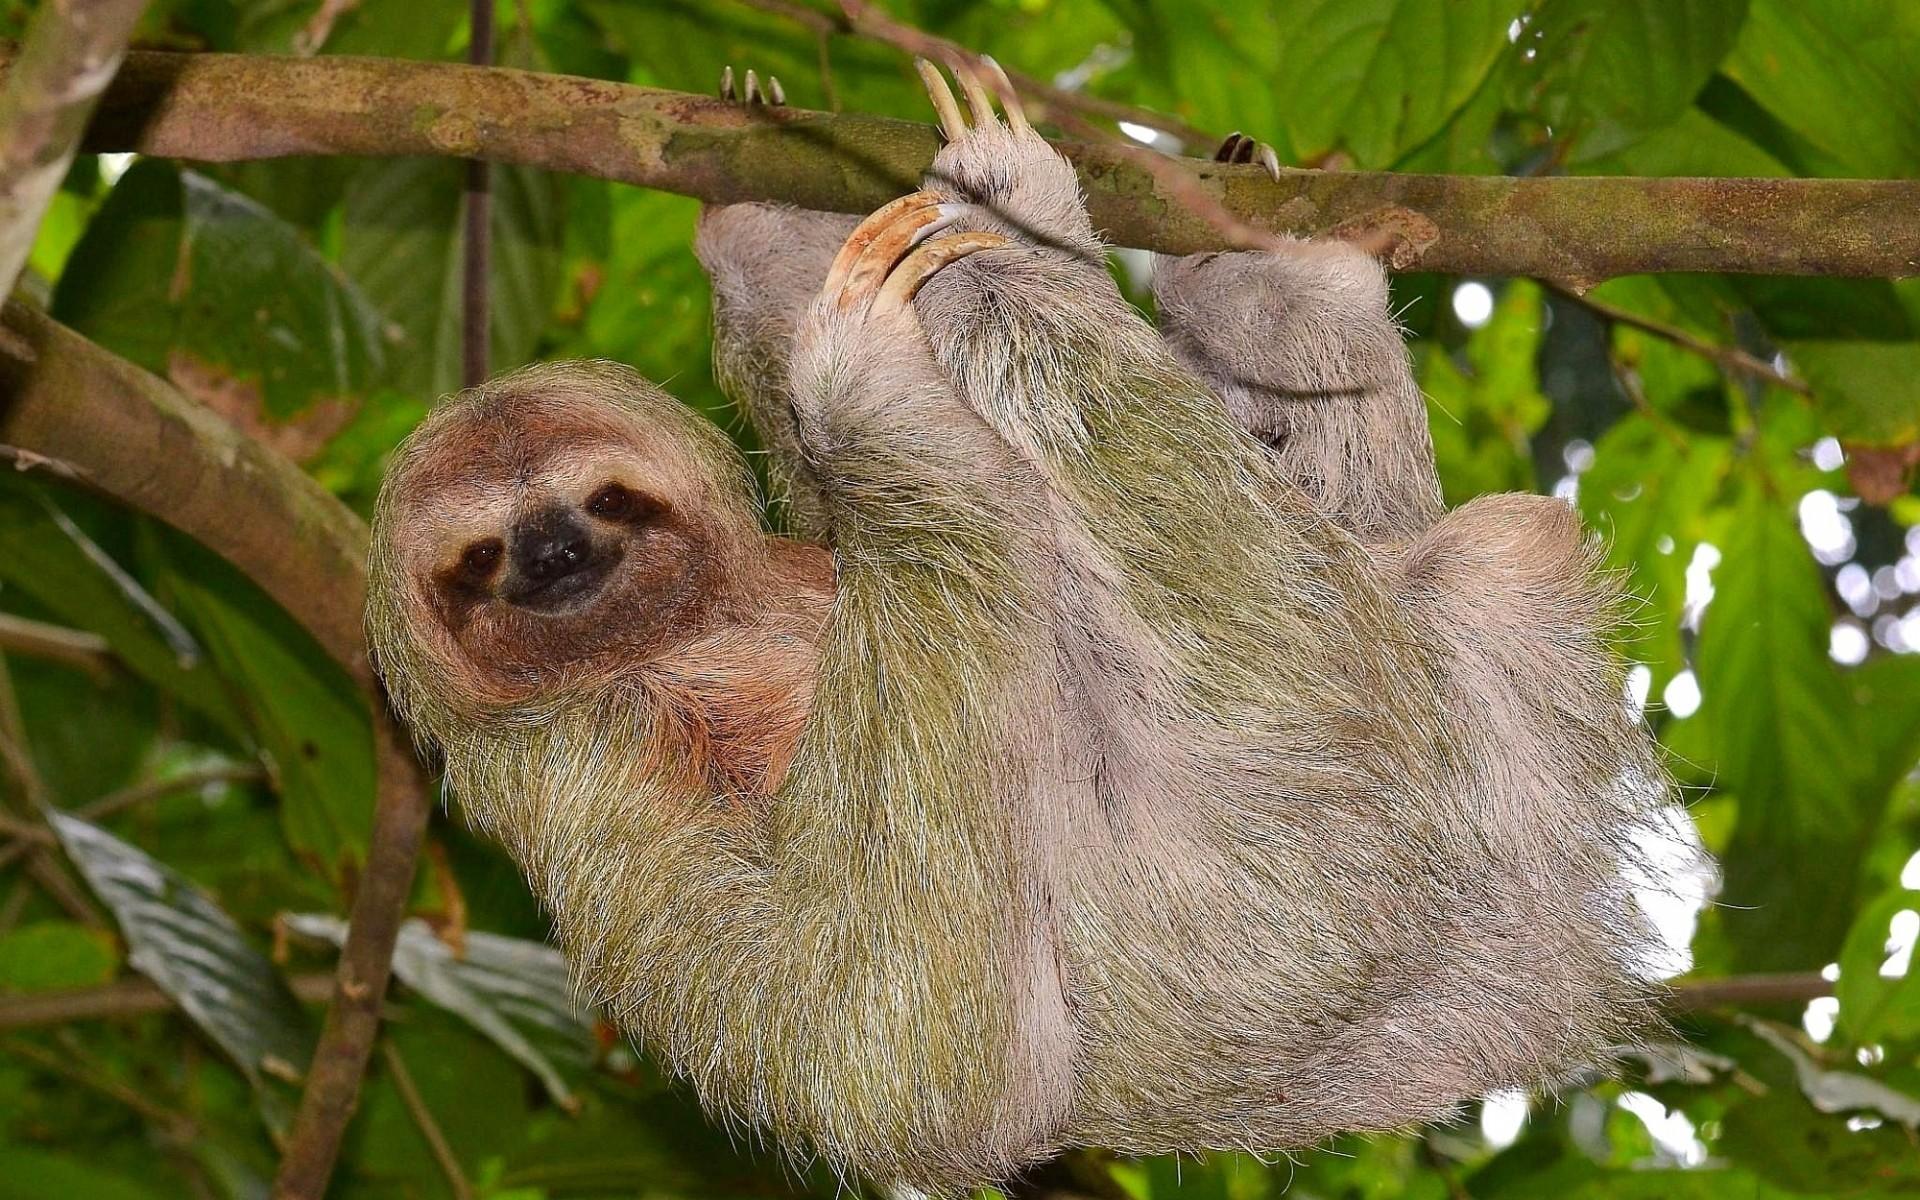 Sloth Wallpaper Cute Download Sloth Hd Backgrounds Free Pixelstalk Net